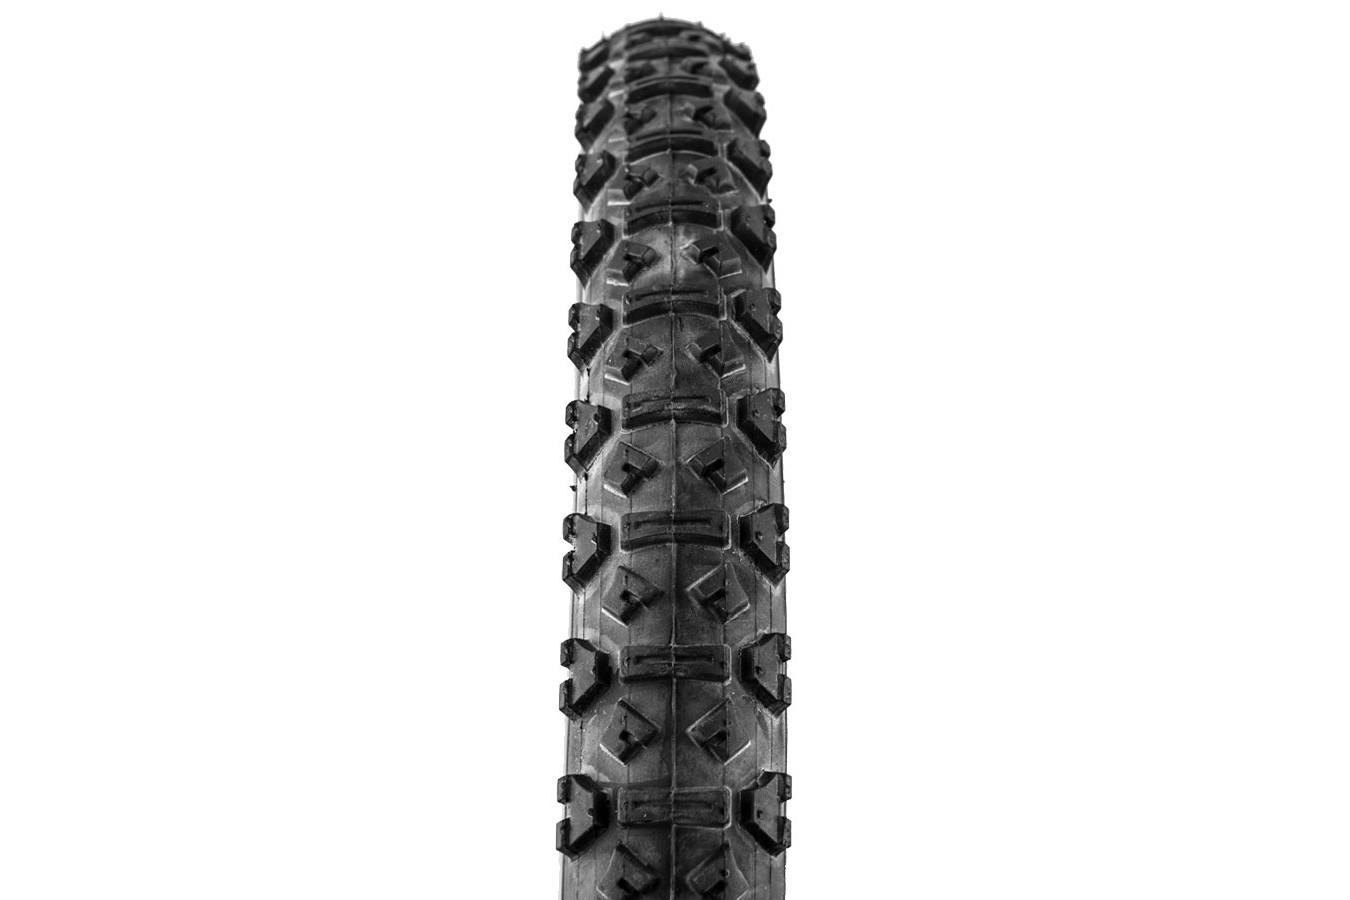 Pneu 20x1.75 (47x406) Cross Preto - Vee Rubber